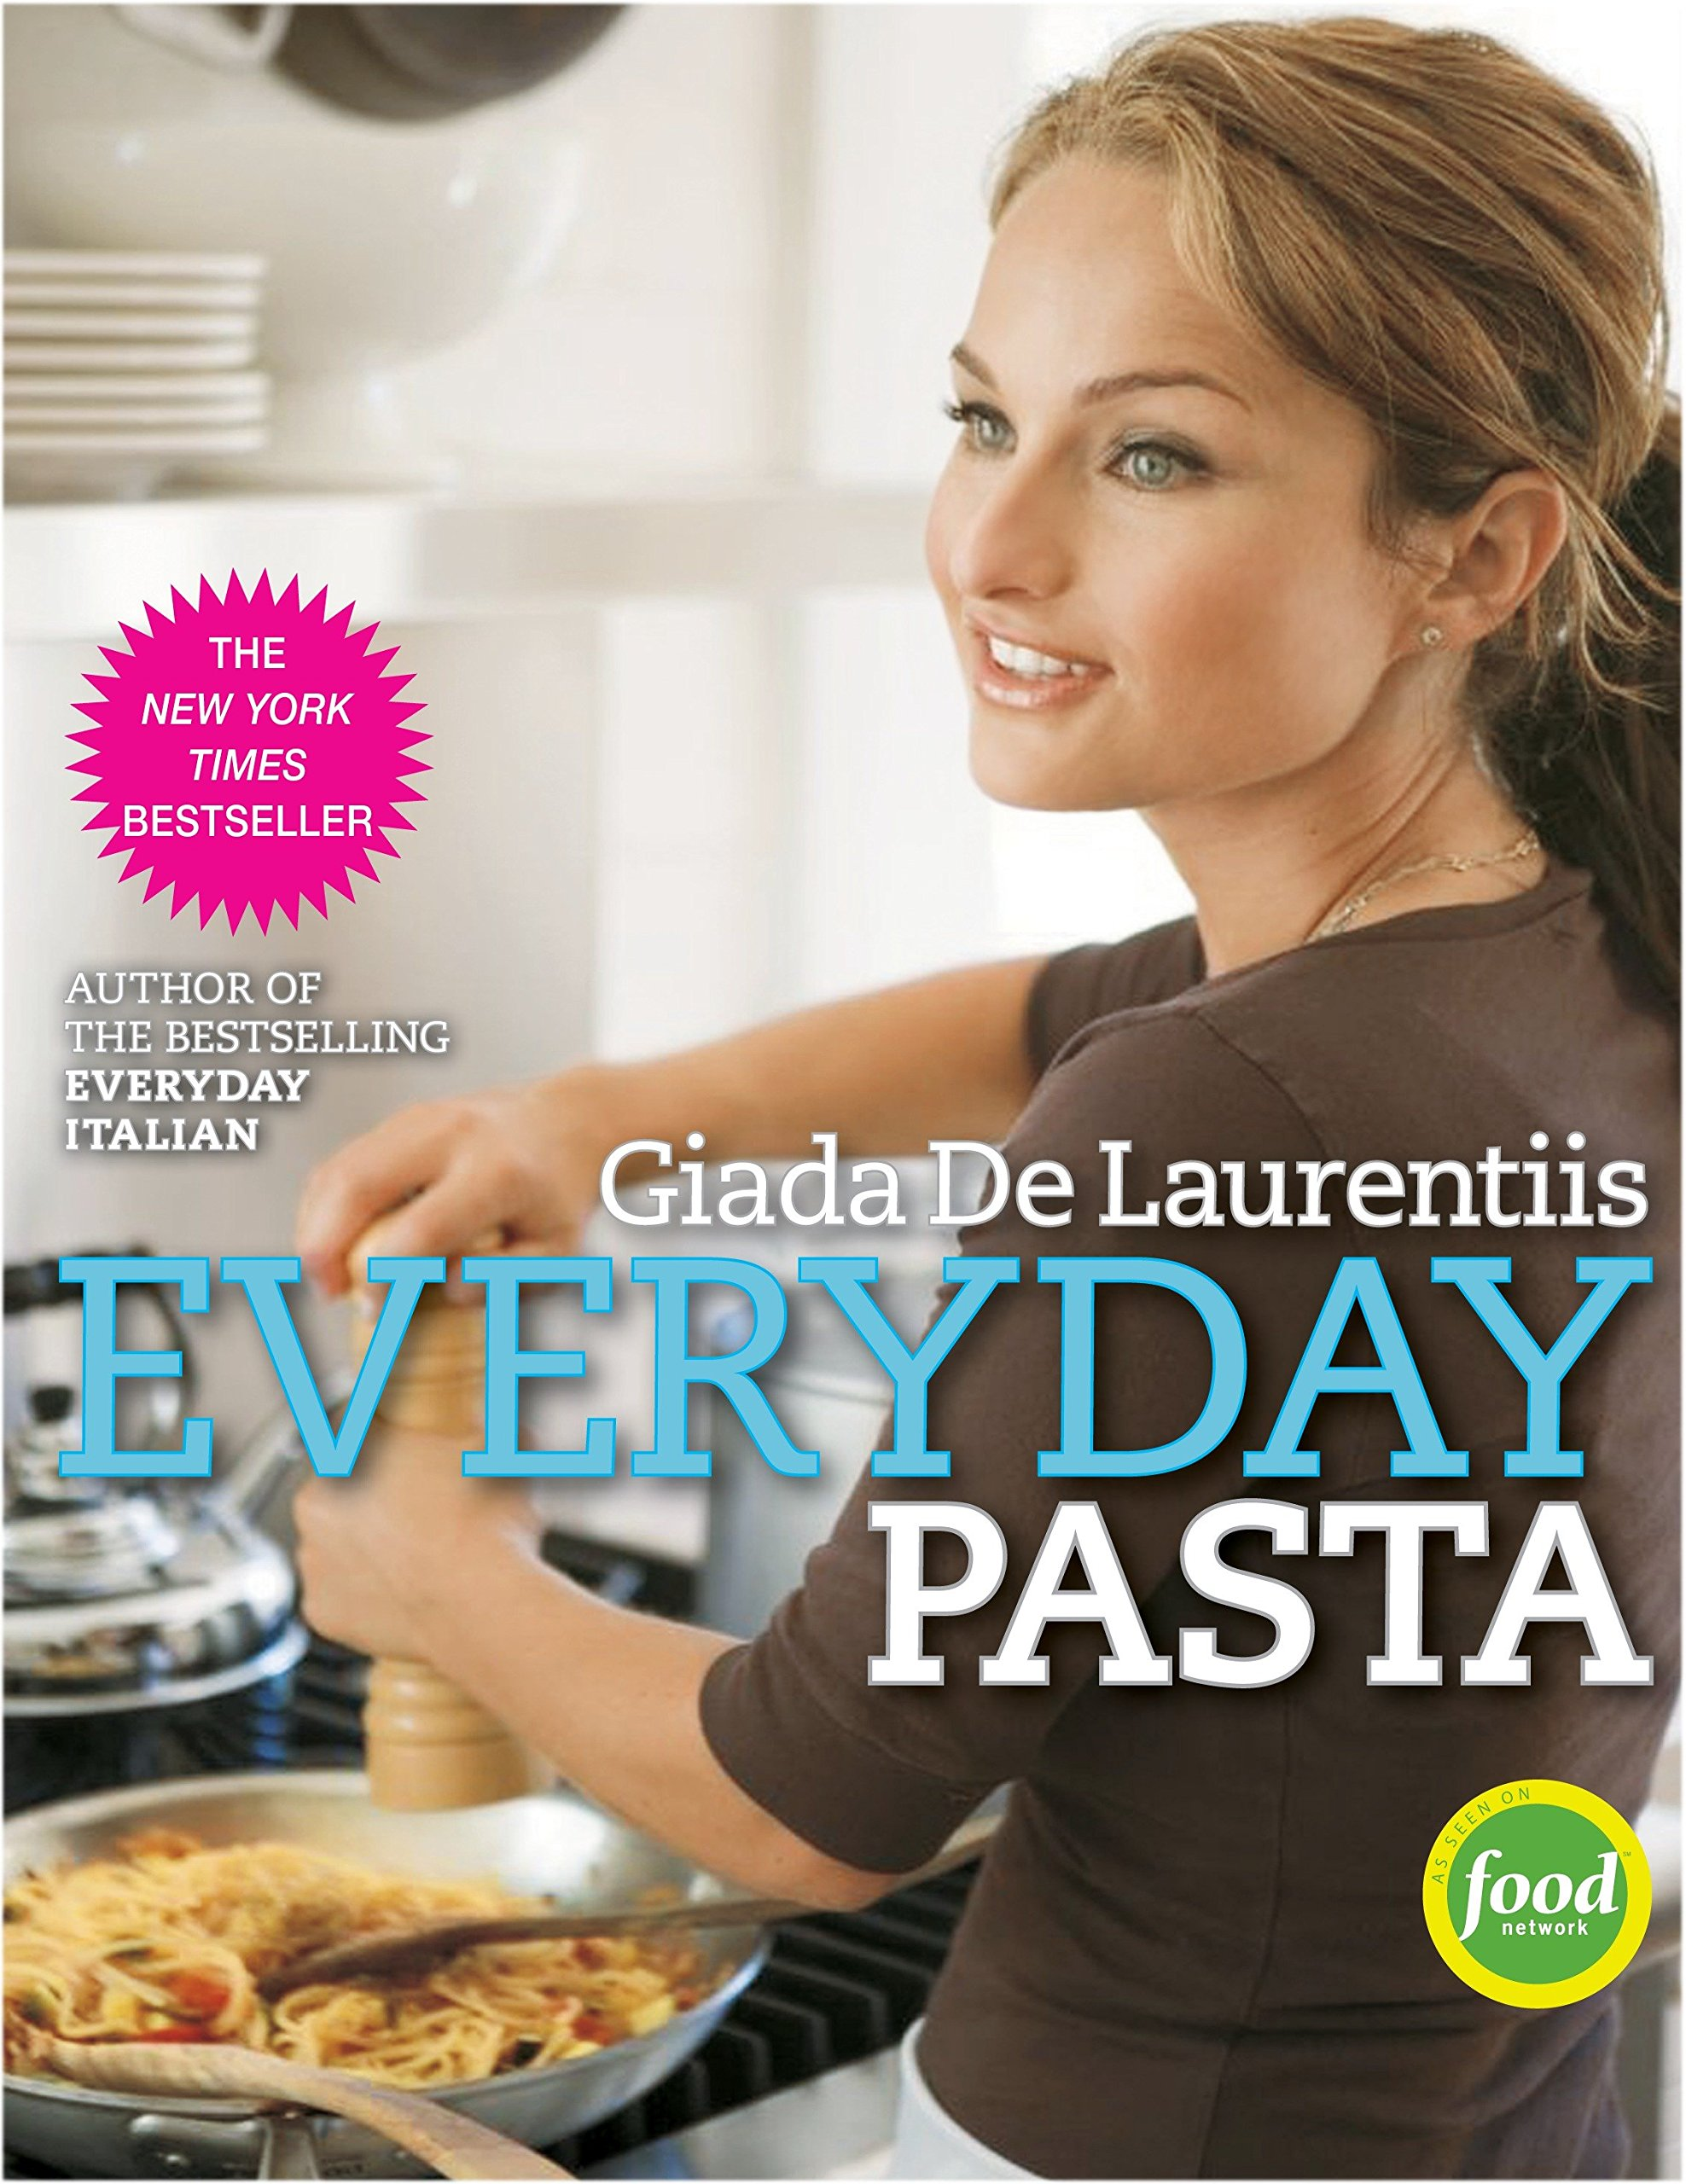 Everyday Pasta A Cookbook De Laurentiis Giada 9780307346582 Amazon Com Books